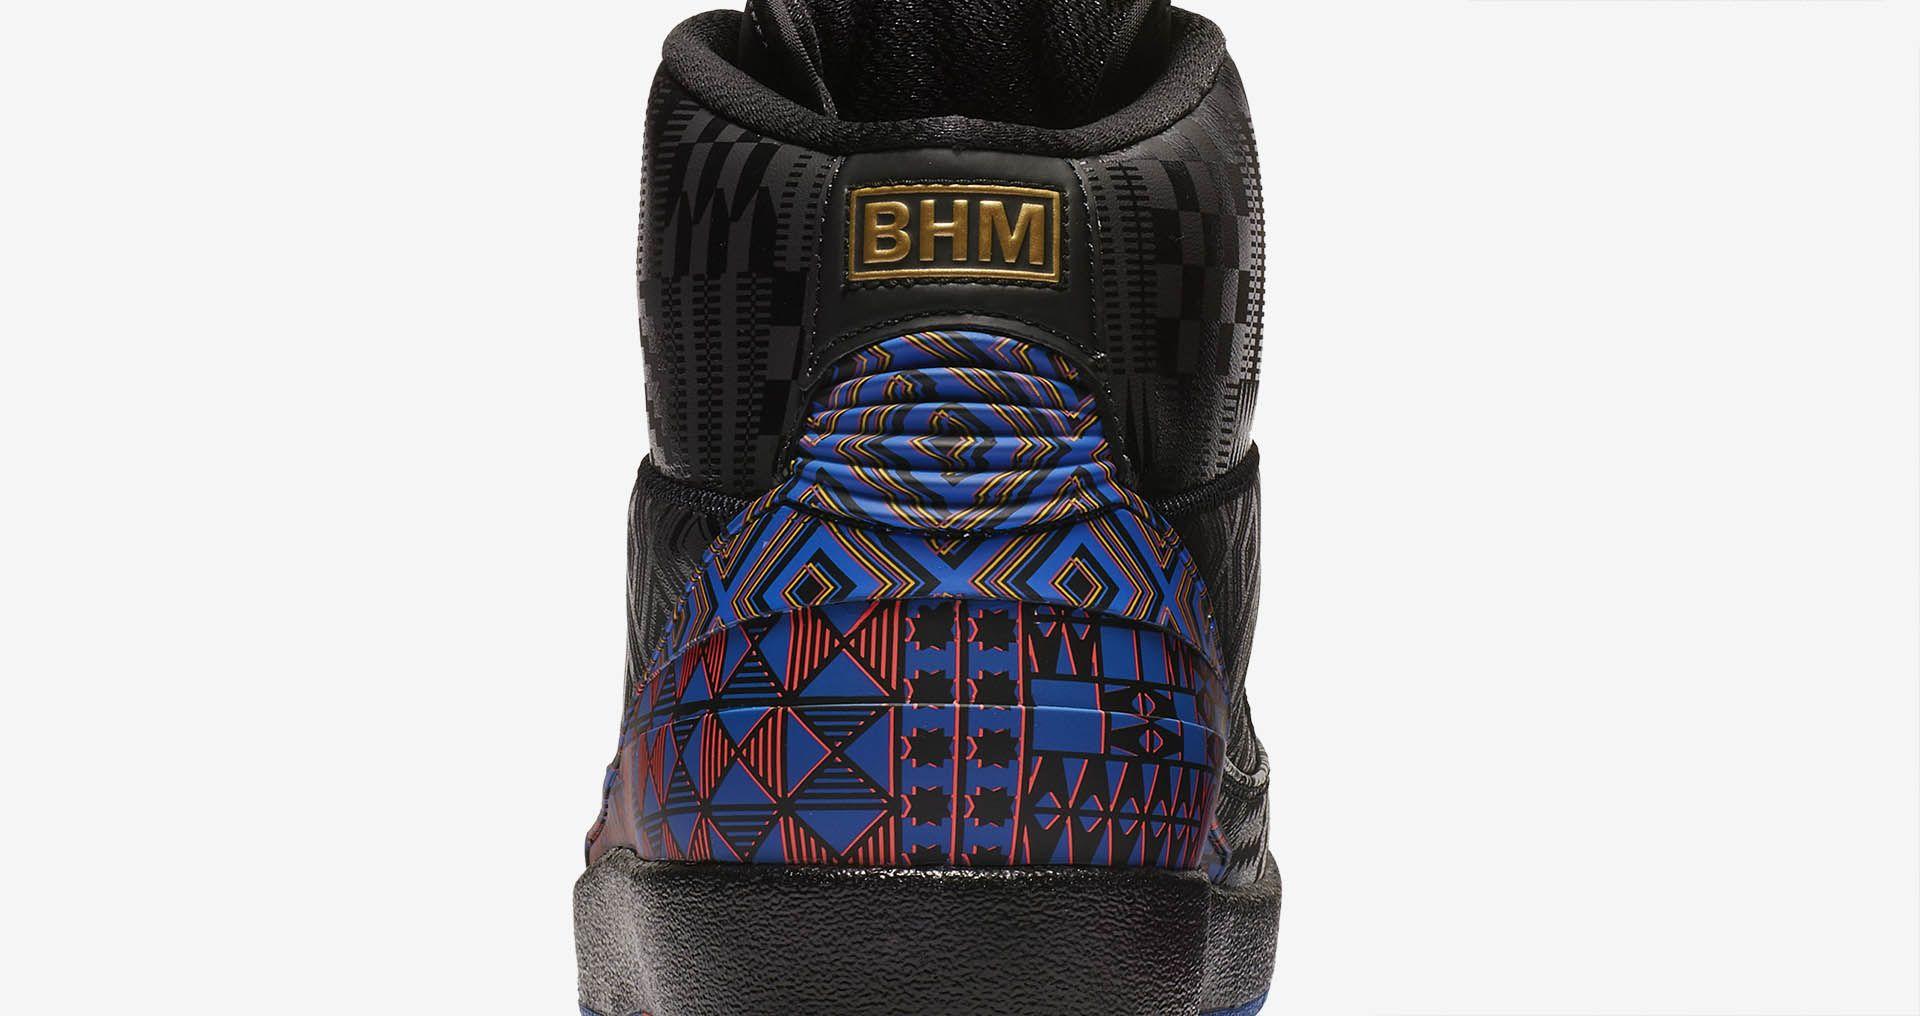 brand new 67269 9d5de Air Jordan 2 'BHM' 2019 Release Date. Nike+ SNKRS